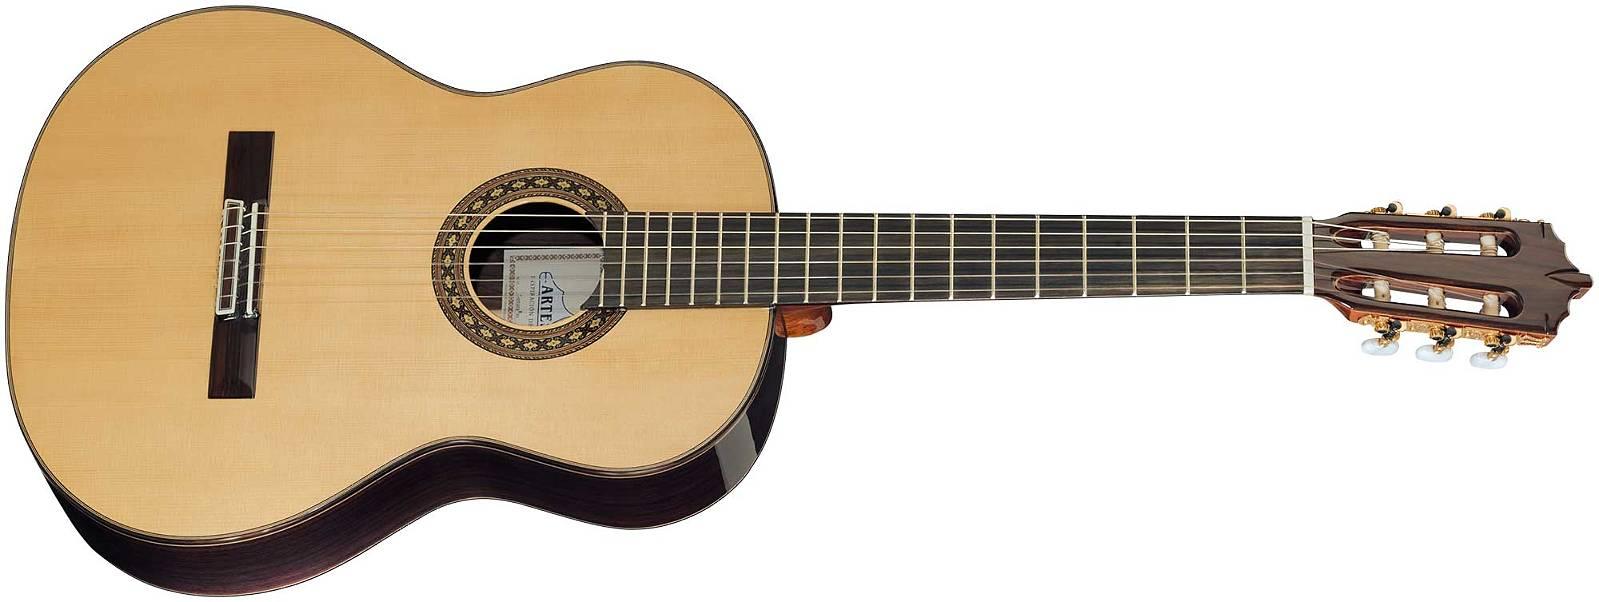 Artesano Sonata RS Konzertgitarre